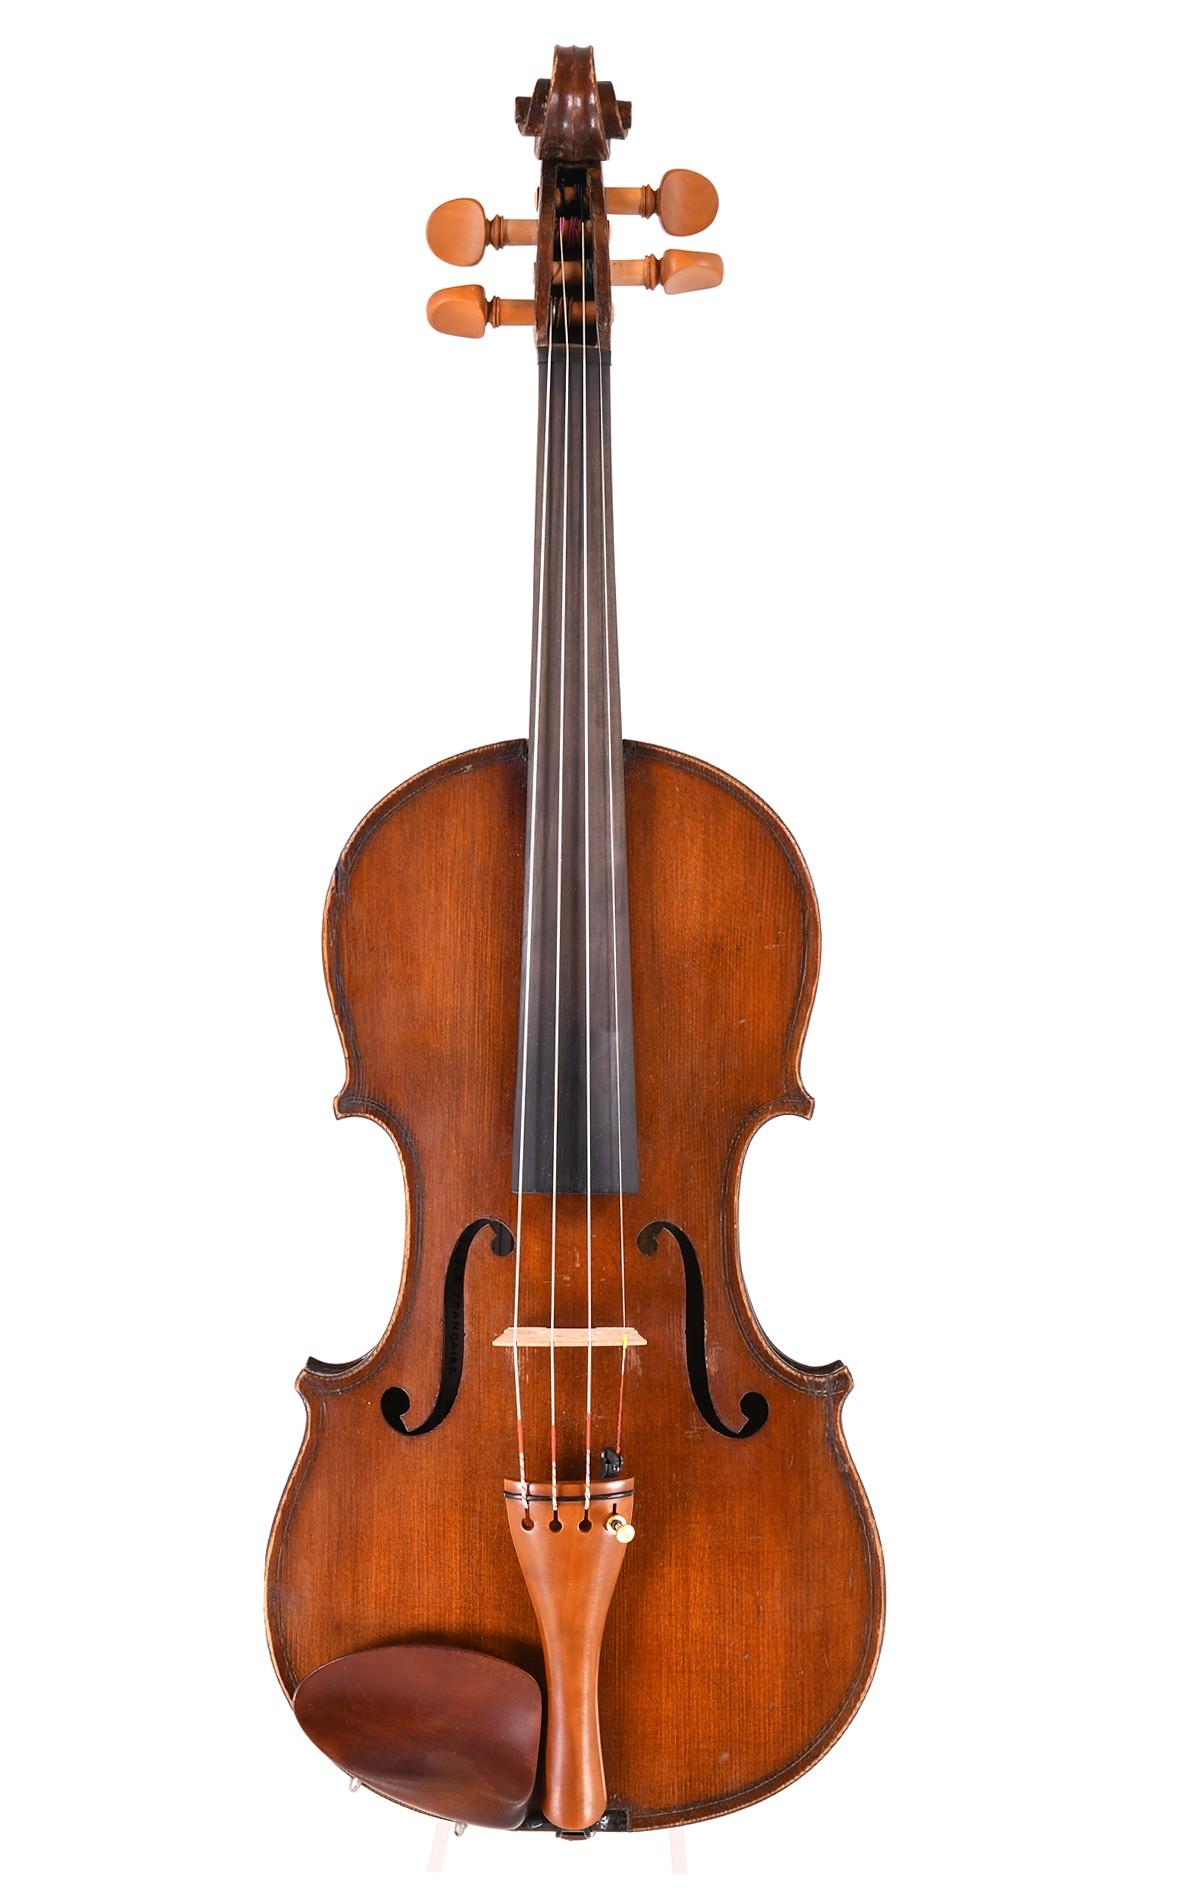 Antike J.T.L. Violine um 1880